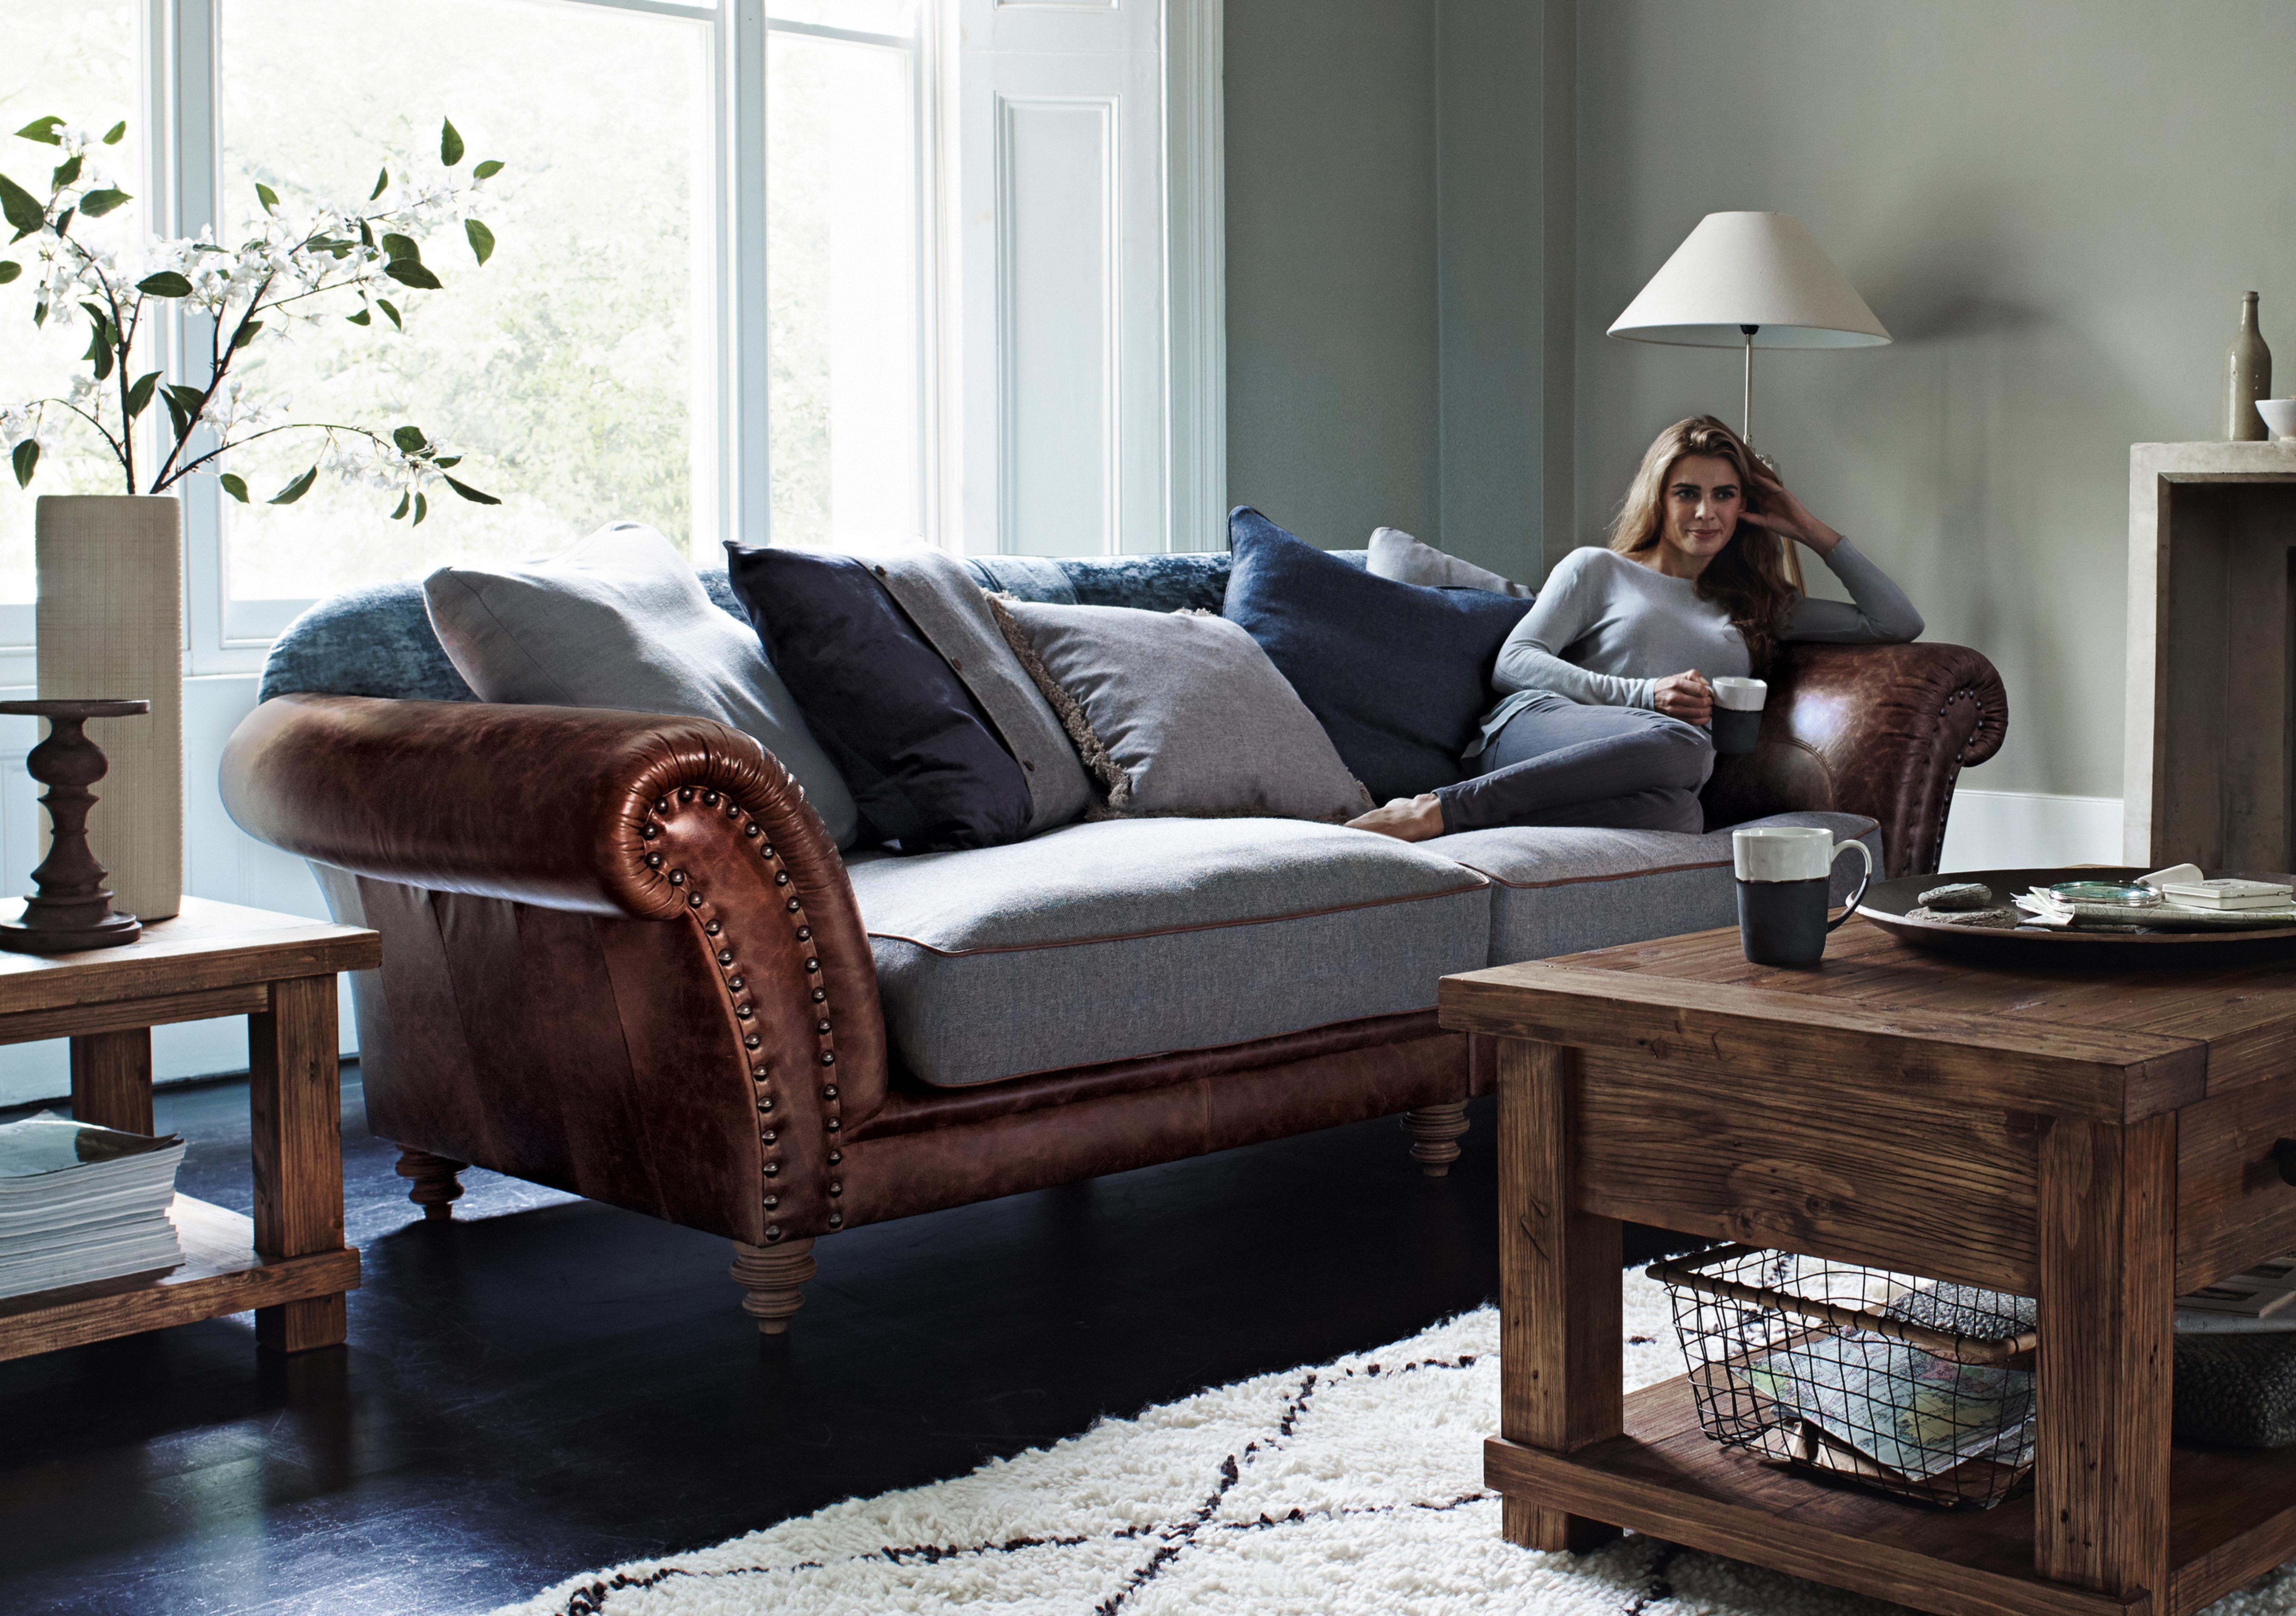 cheap sofa sets under 500 steve silver co silverado 4 seater sofas large furniture village save